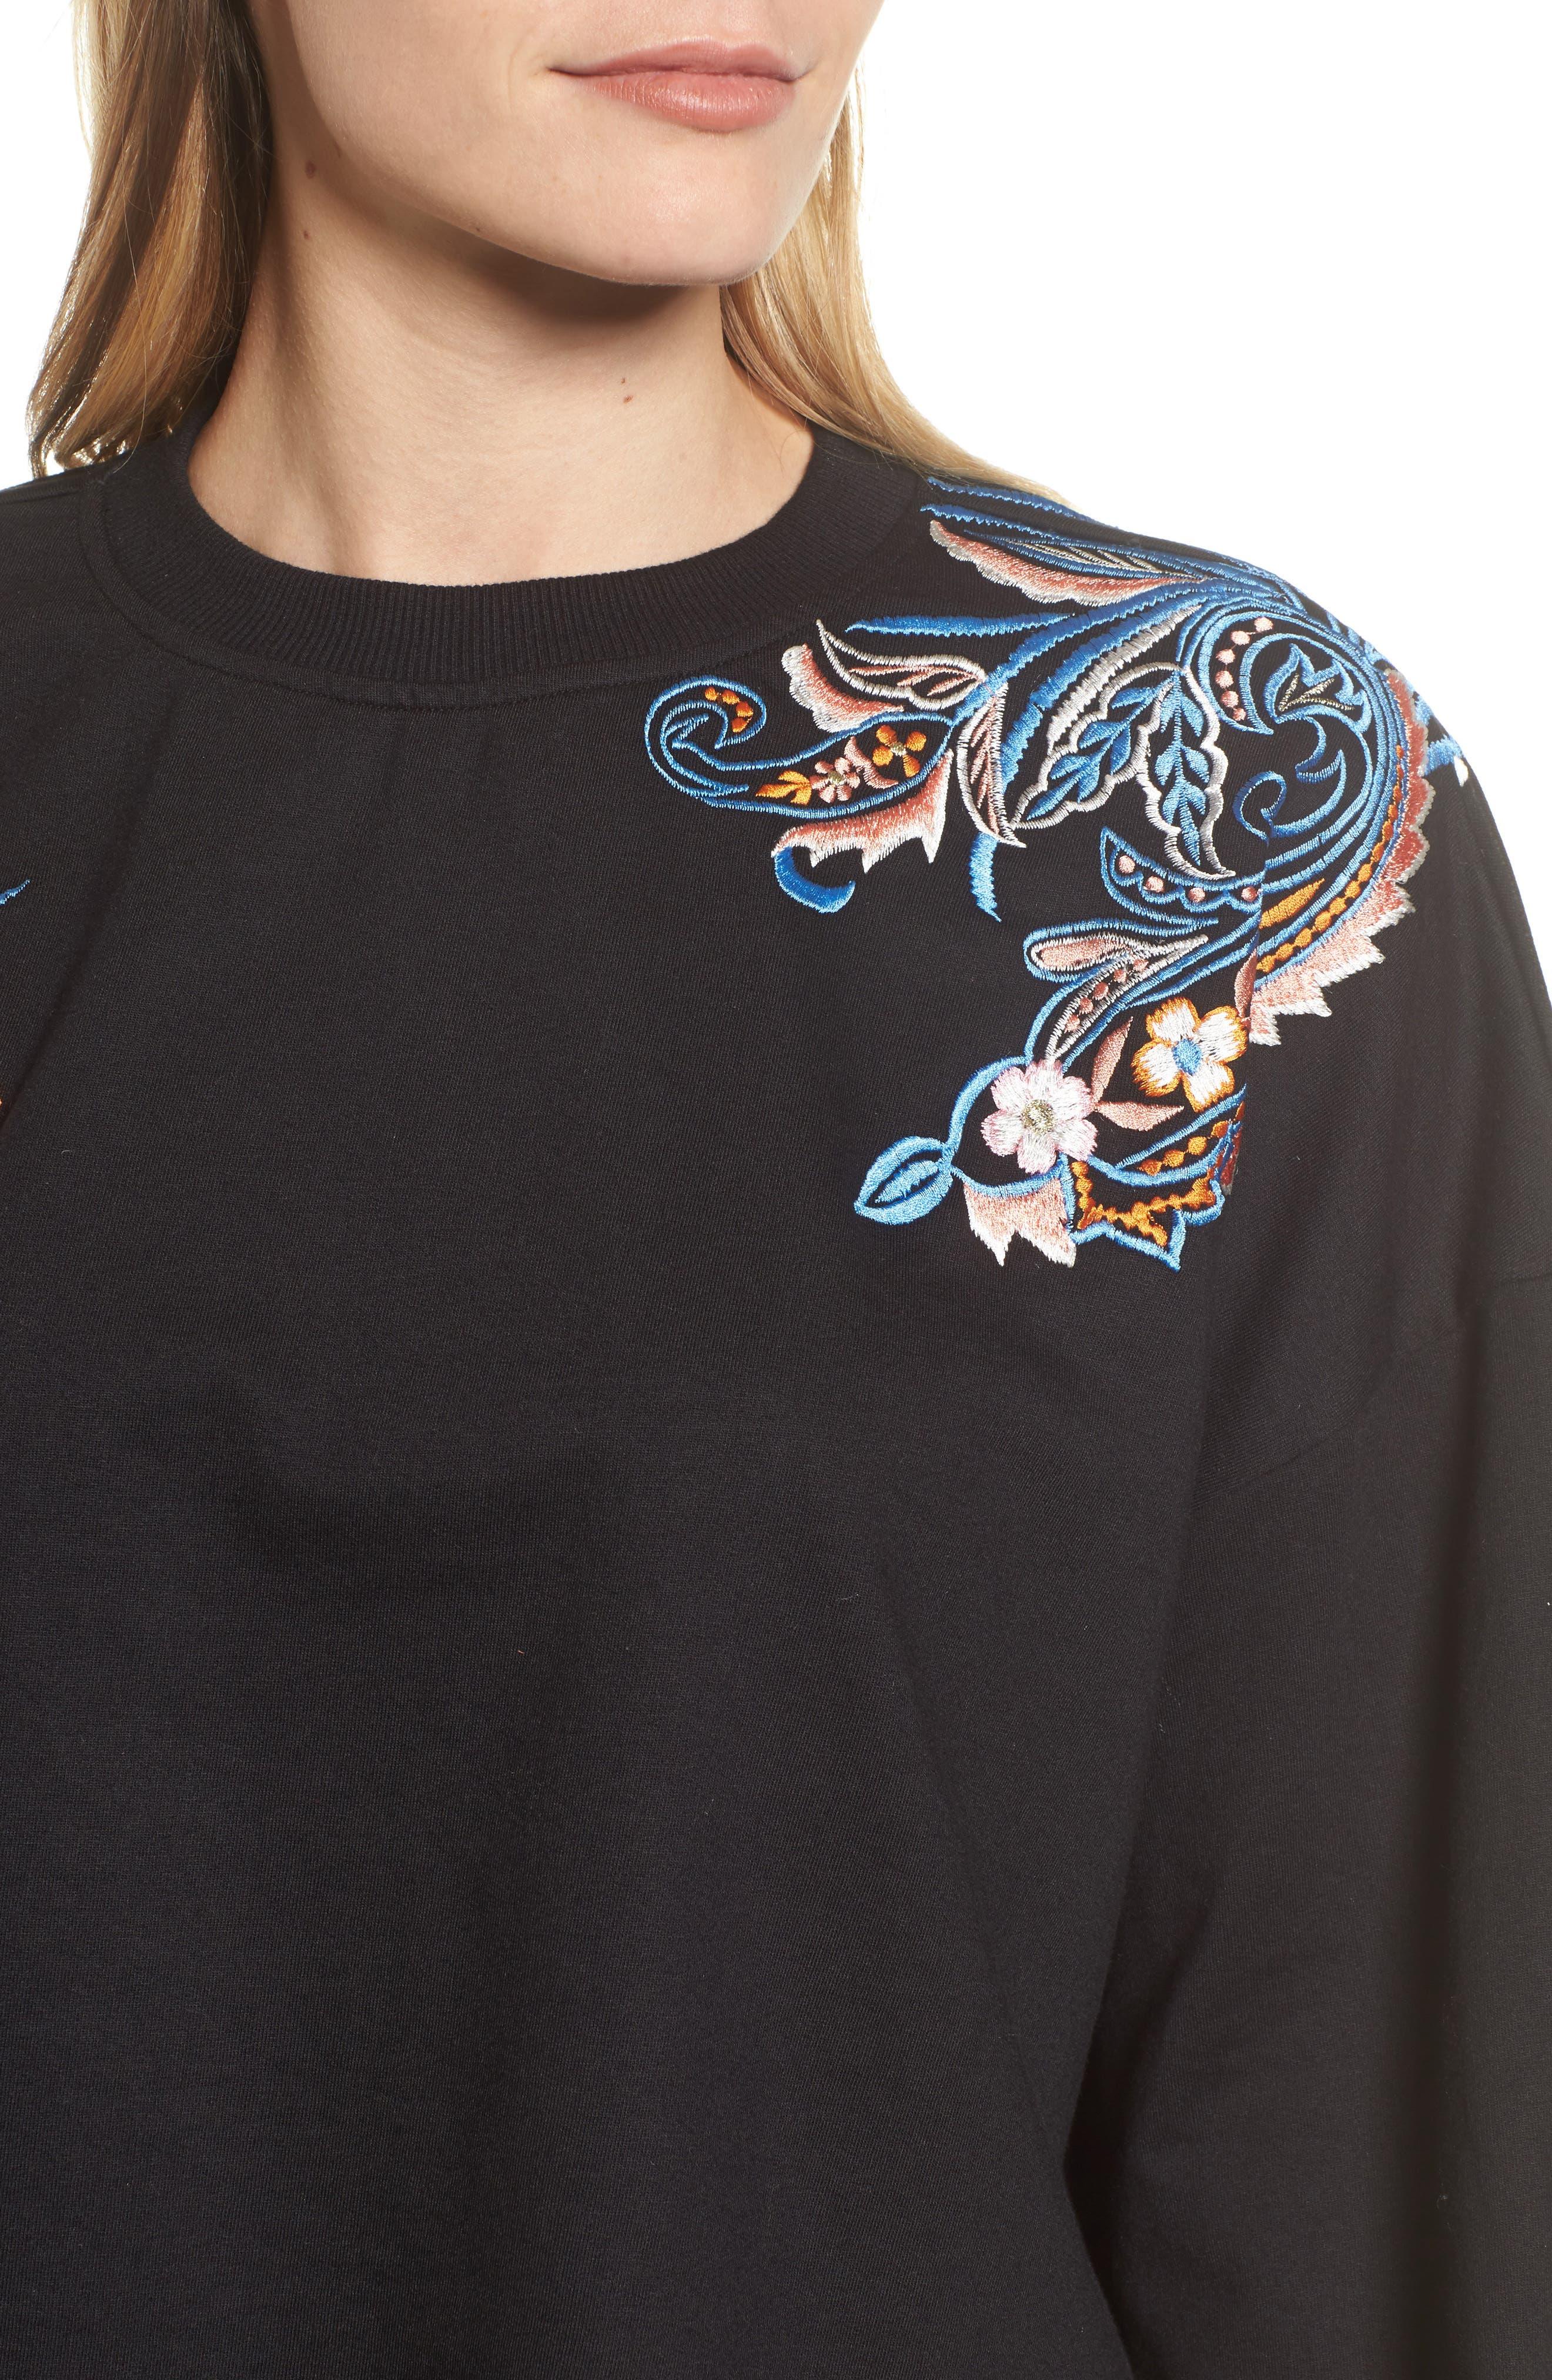 Carlisle Embroidered Sweatshirt,                             Alternate thumbnail 4, color,                             BLACK